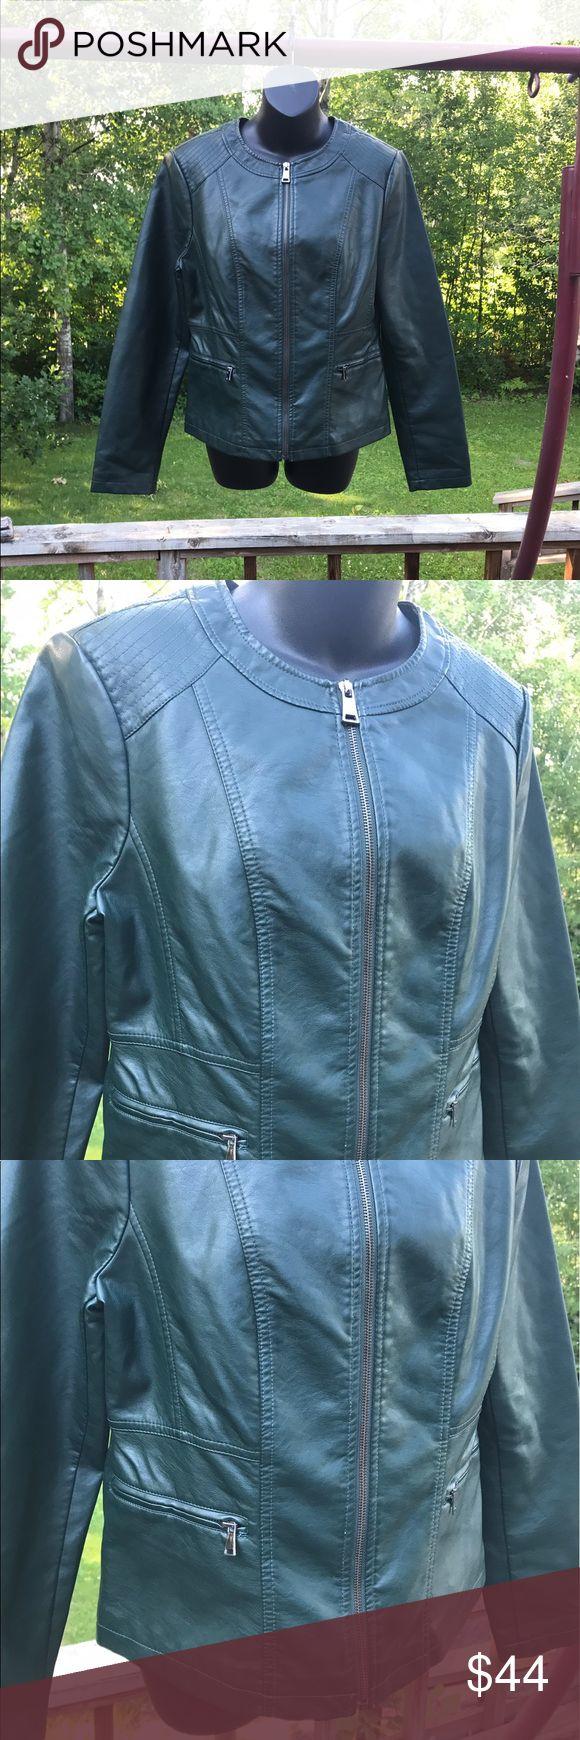 Green Leather Jacket Dark emerald green leather jacket. Working zippers, has pockets. #green #leather #jacket #zipup #pockets #cute #stylish Roz & Ali Jackets & Coats